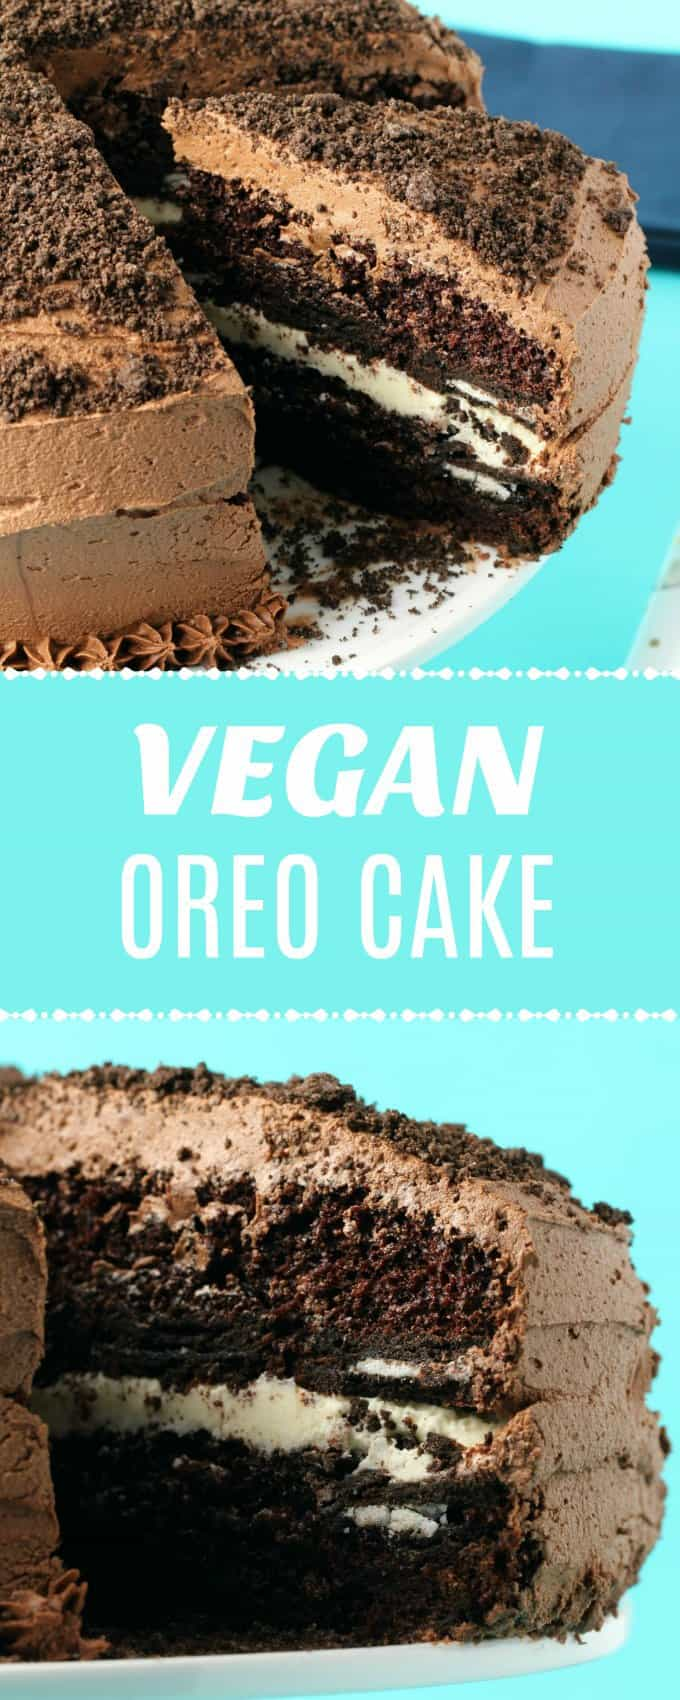 Vegan Oreo Cake